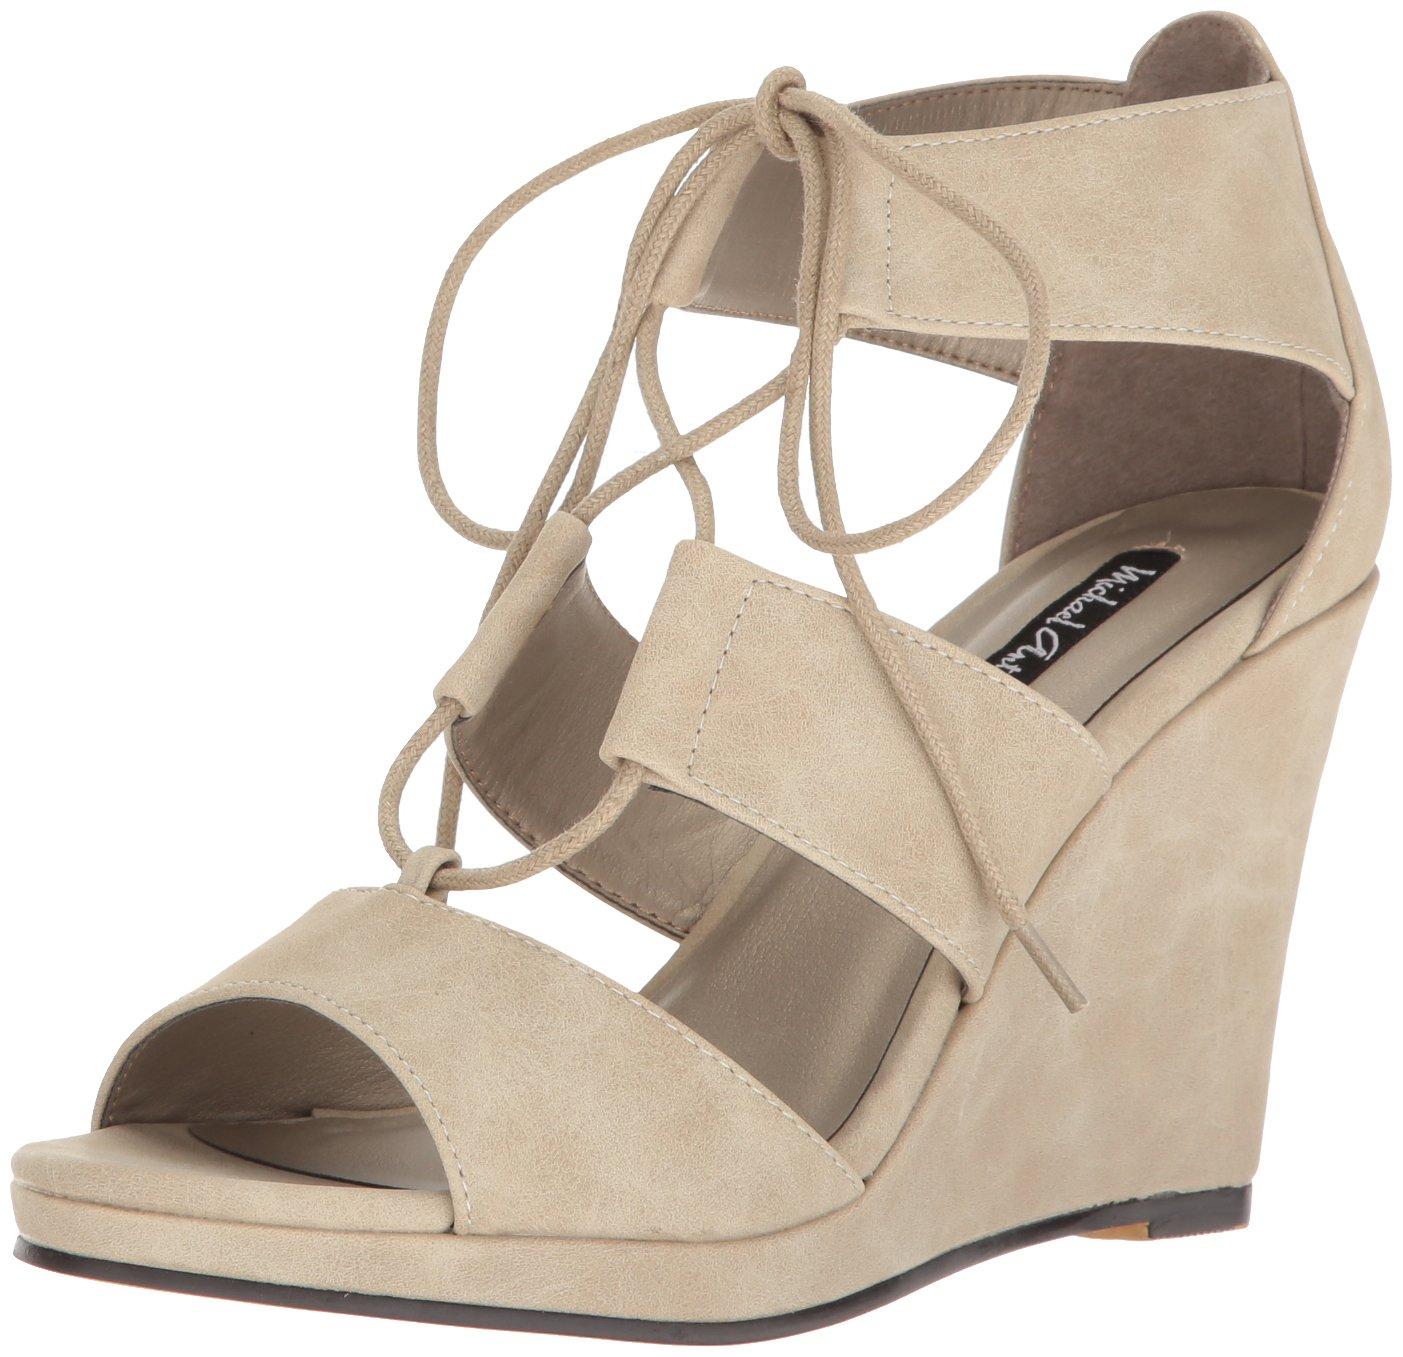 Michael Antonio Women's Andra Wedge Sandal B01N1GXWW8 6 B(M) US|Winter White